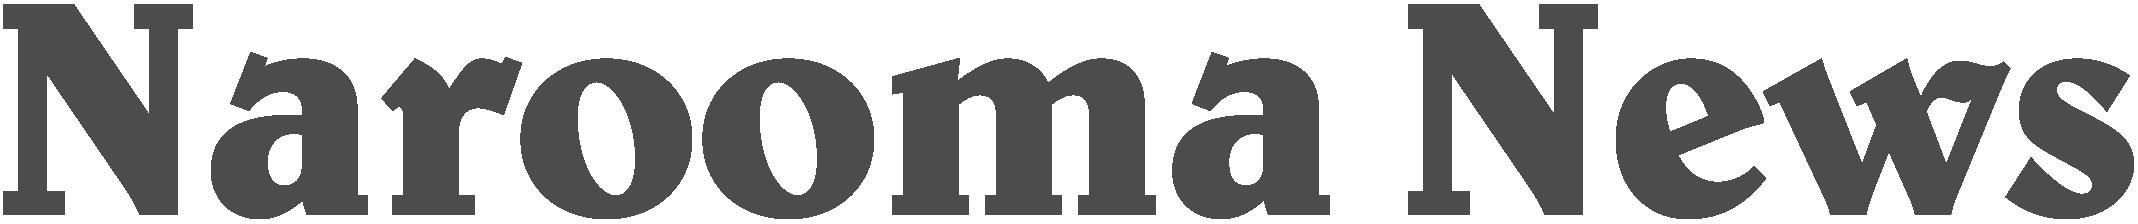 Narooma News